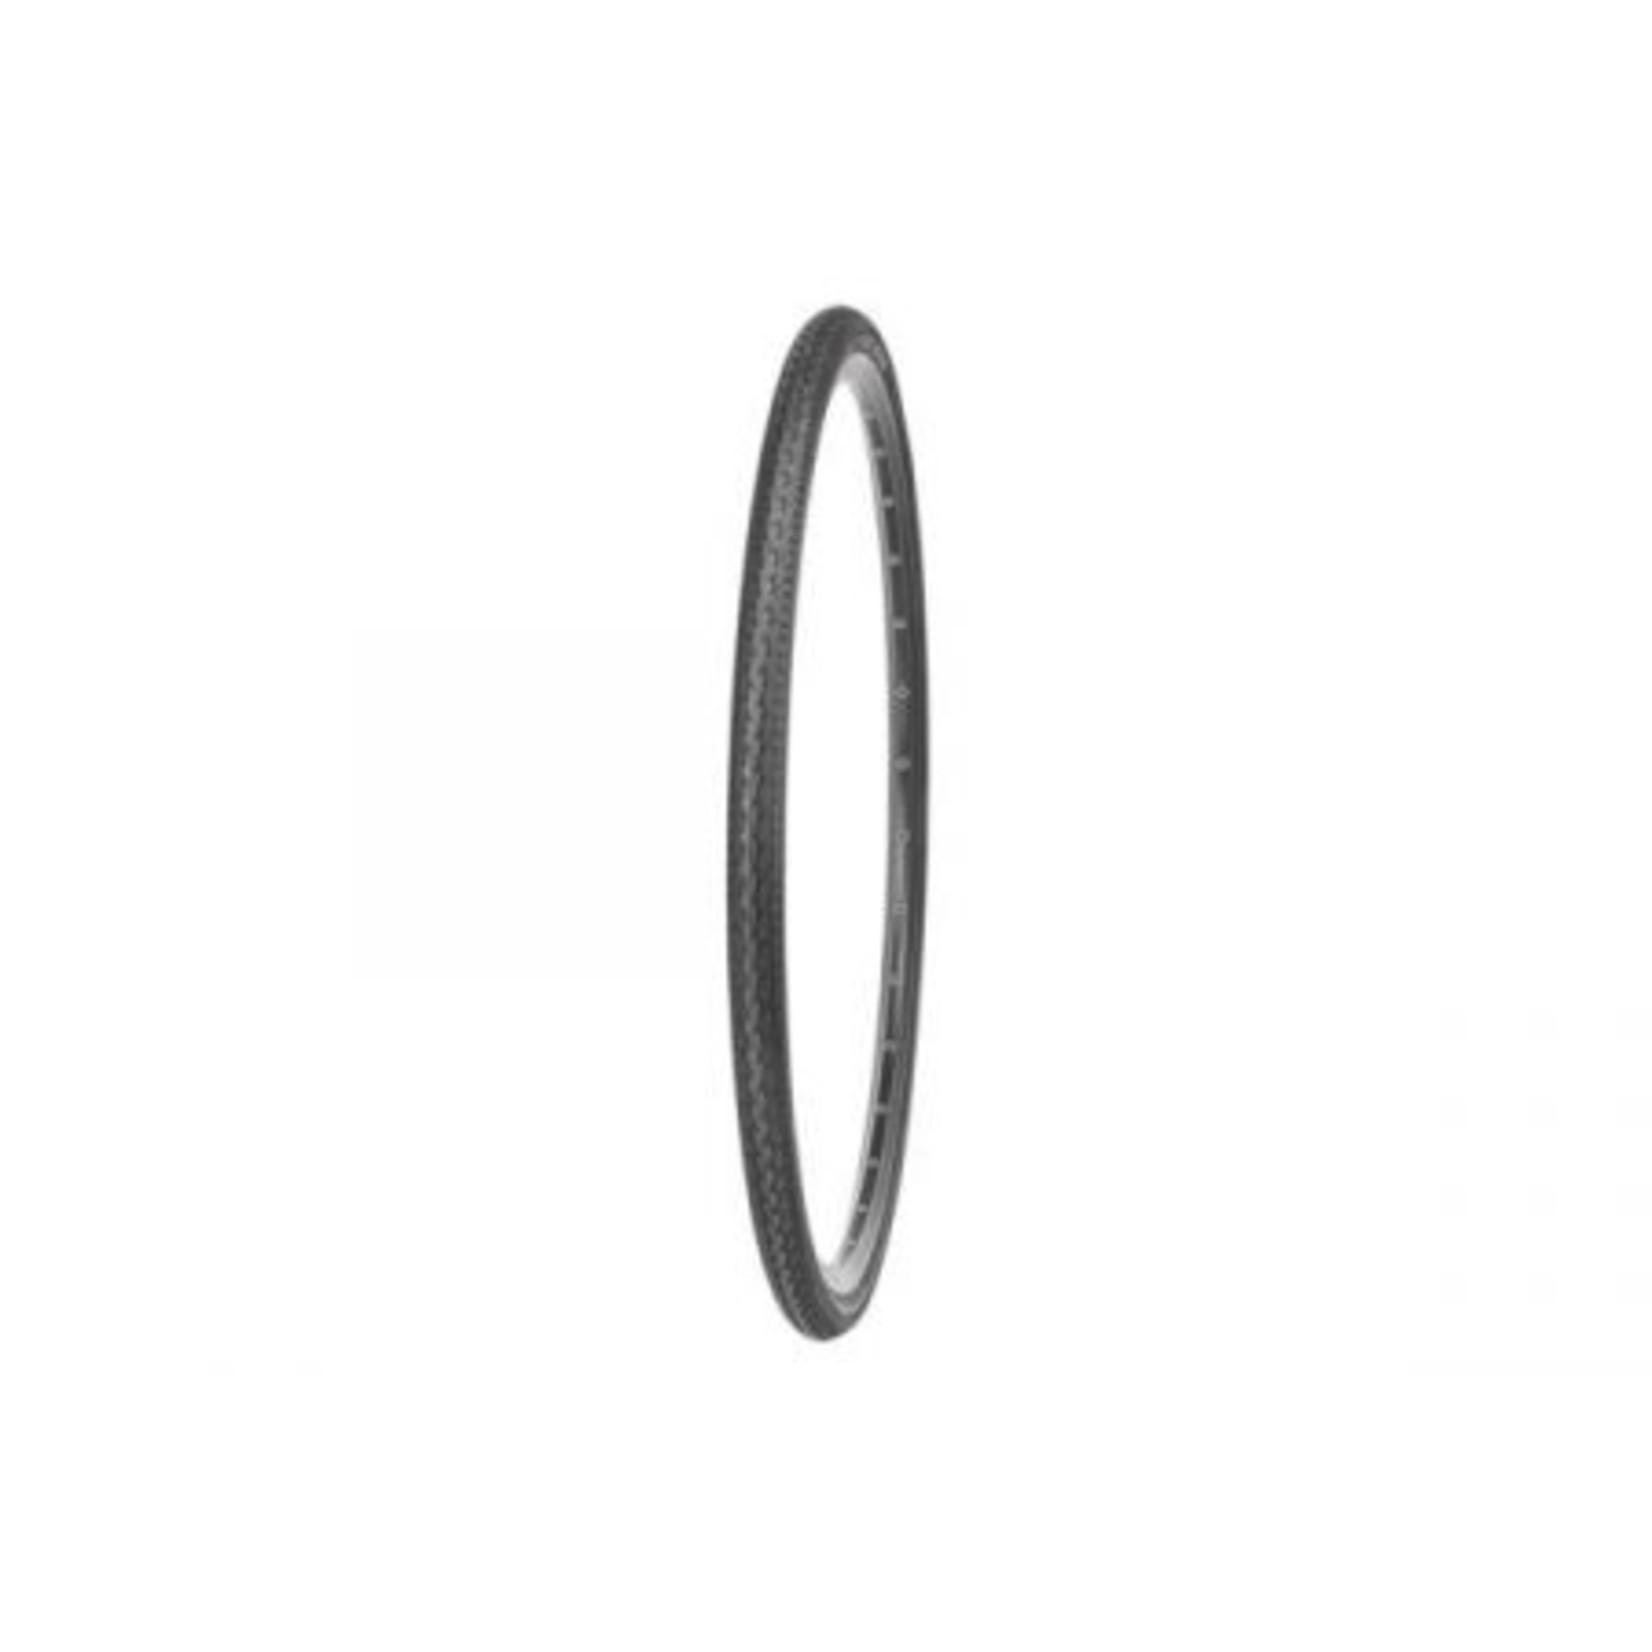 700 x 38c (40-622) One 0 One Tyre - Black